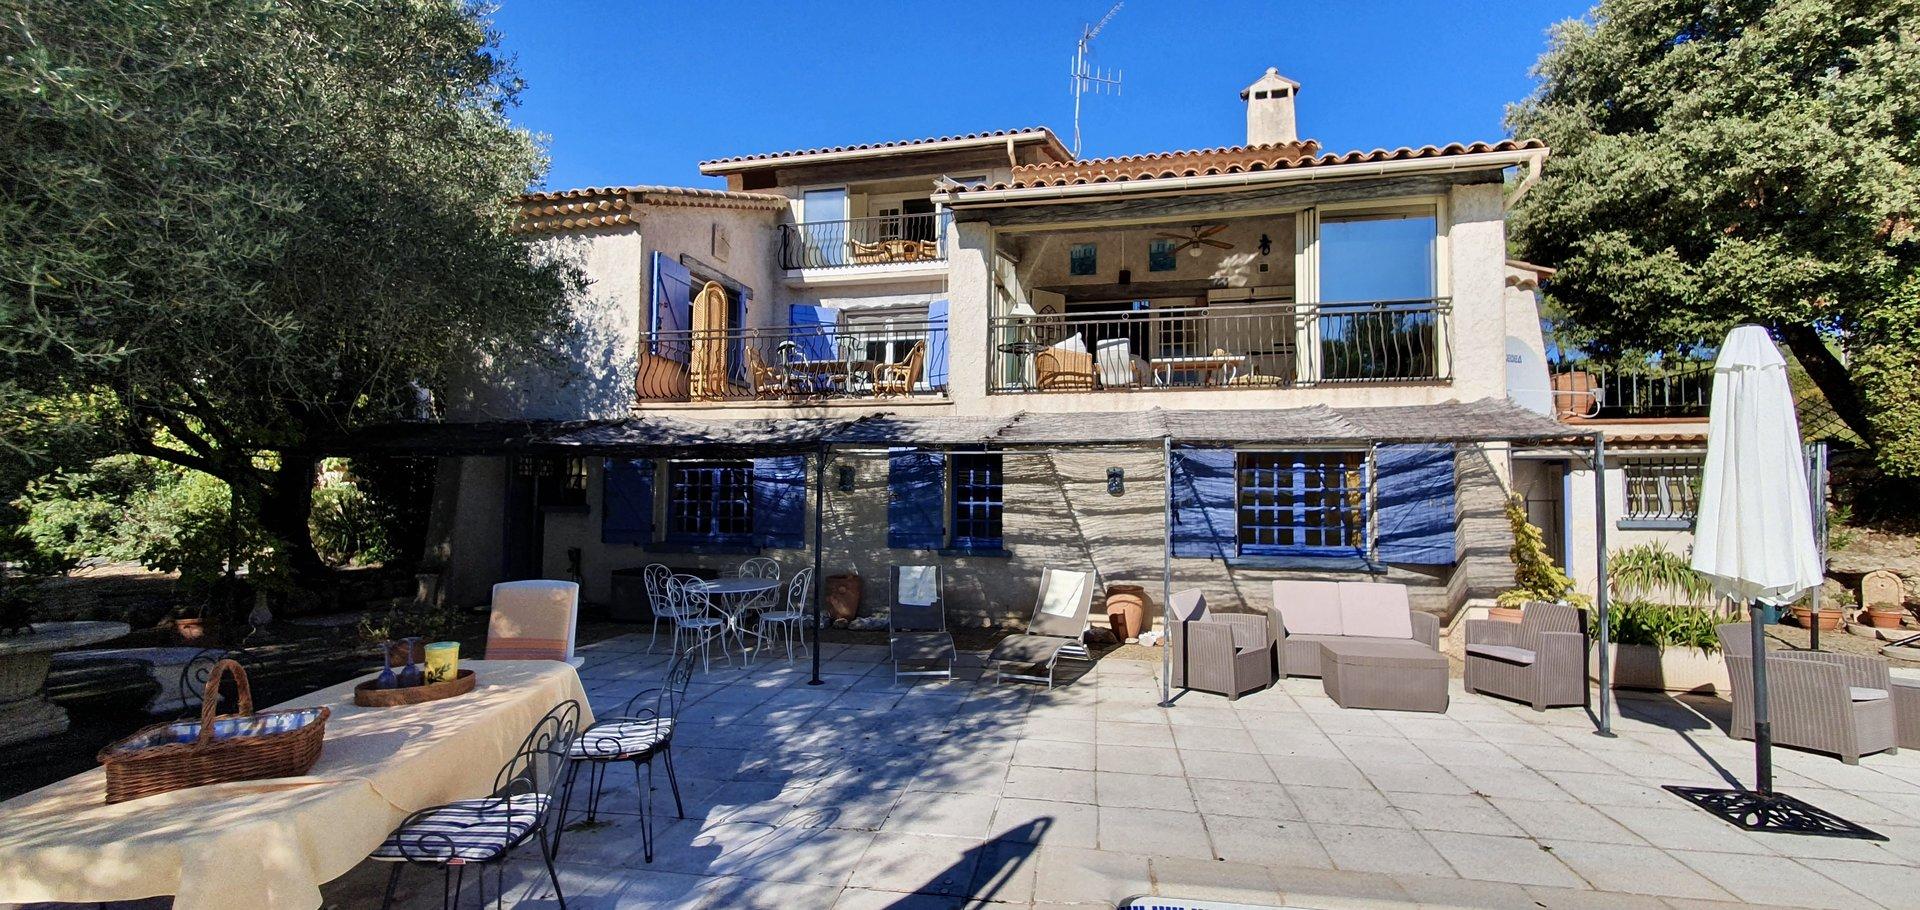 Mooie Provençaalse villa in Les Arcs, centraal gelegen